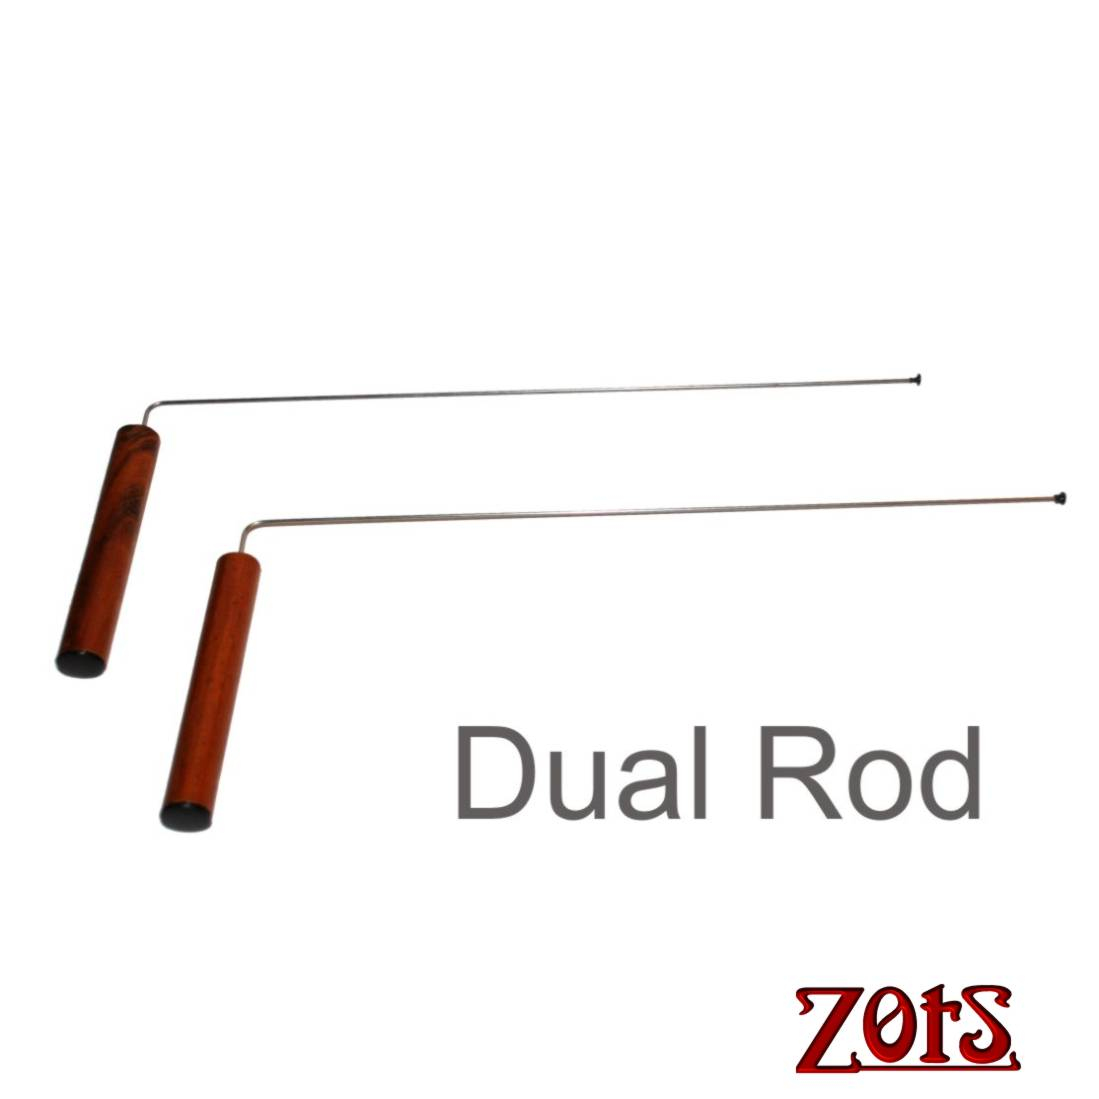 Dual Rod